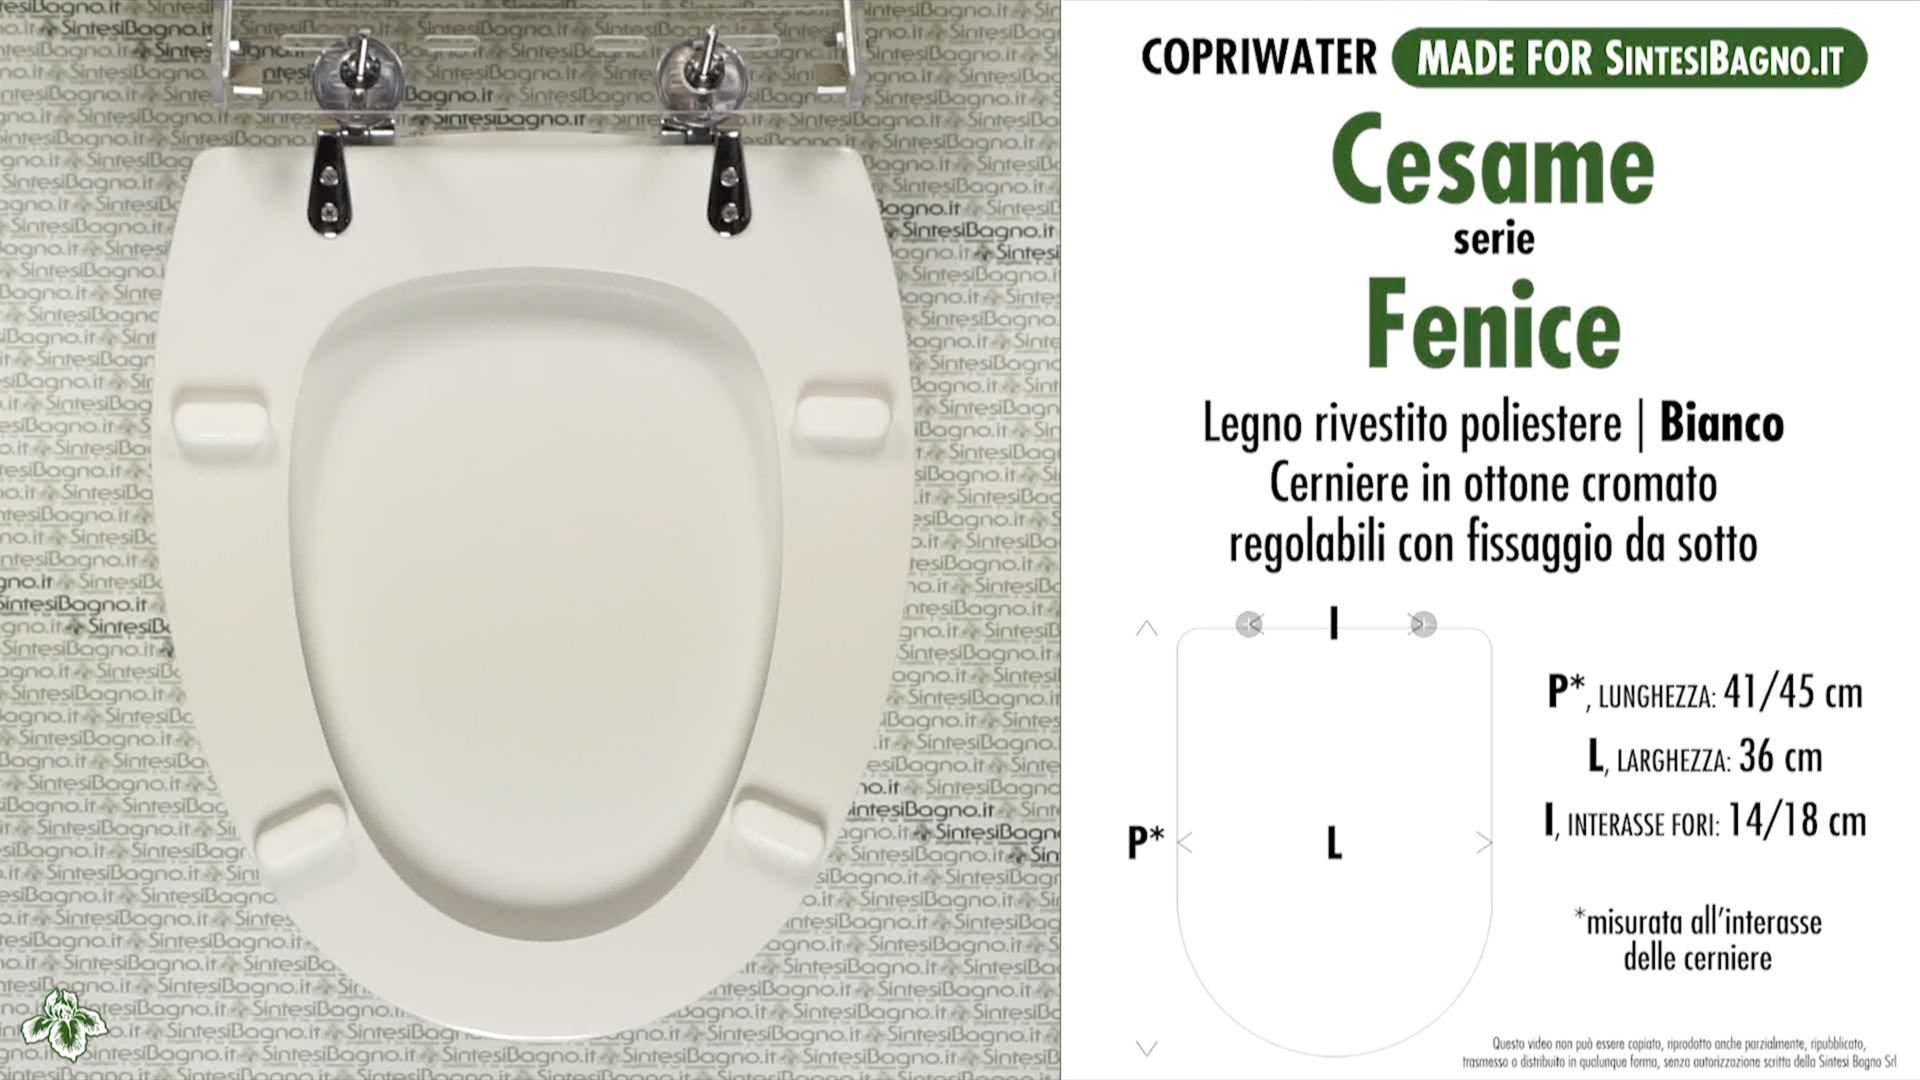 SCHEDA TECNICA MISURE copriwater CESAME FENICE